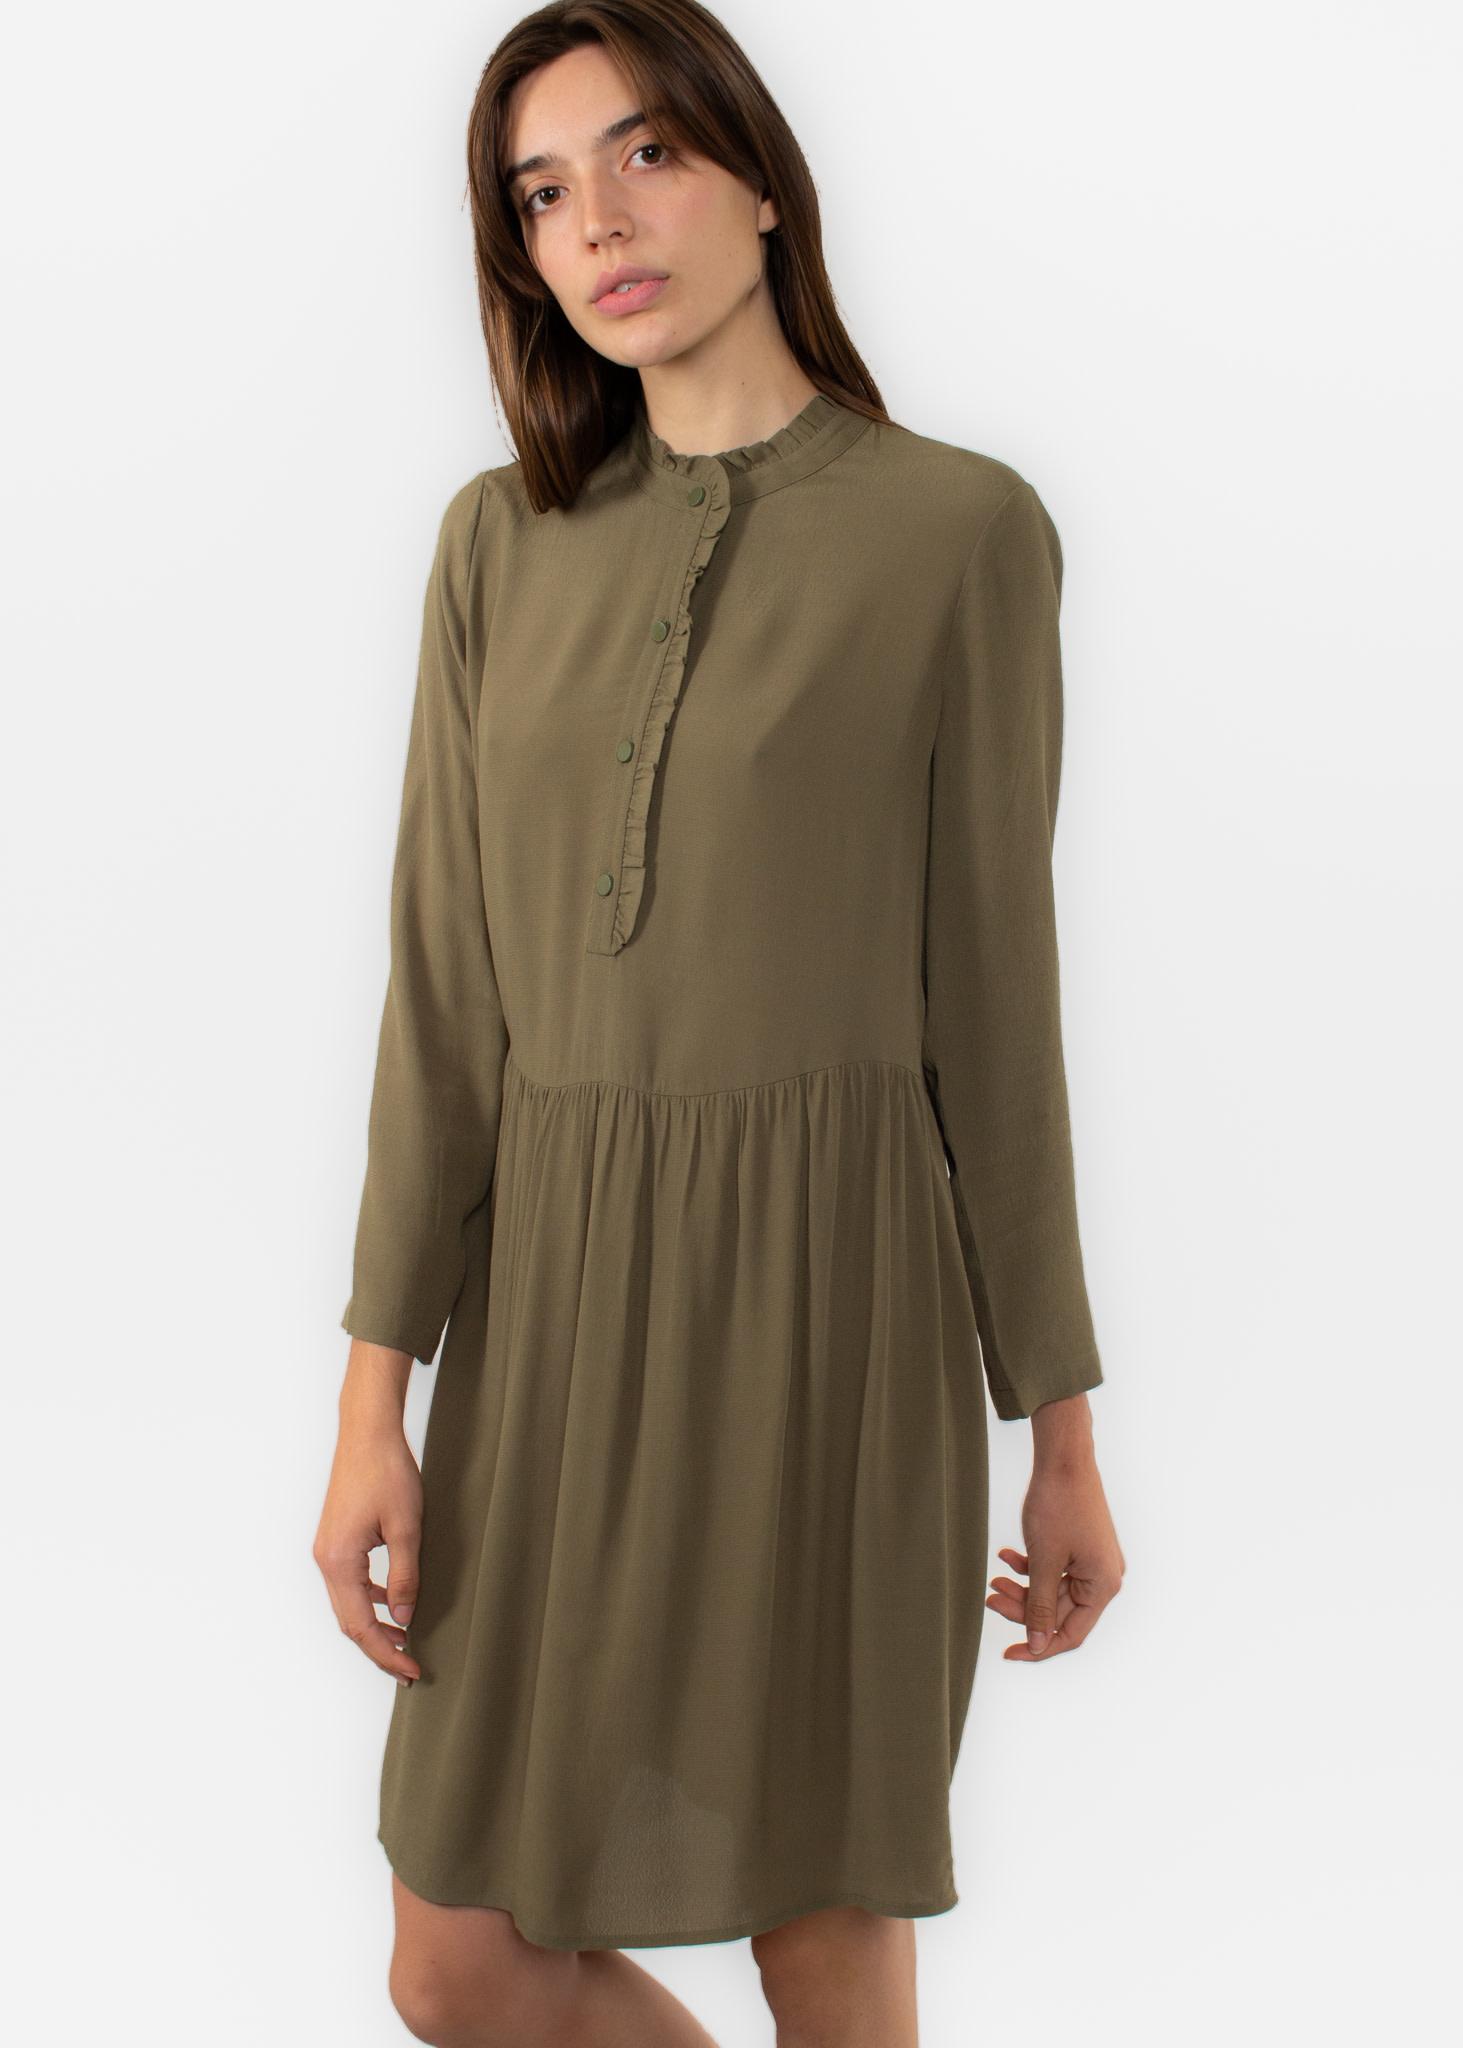 DES PETITS HAUTS Salma robe fougère